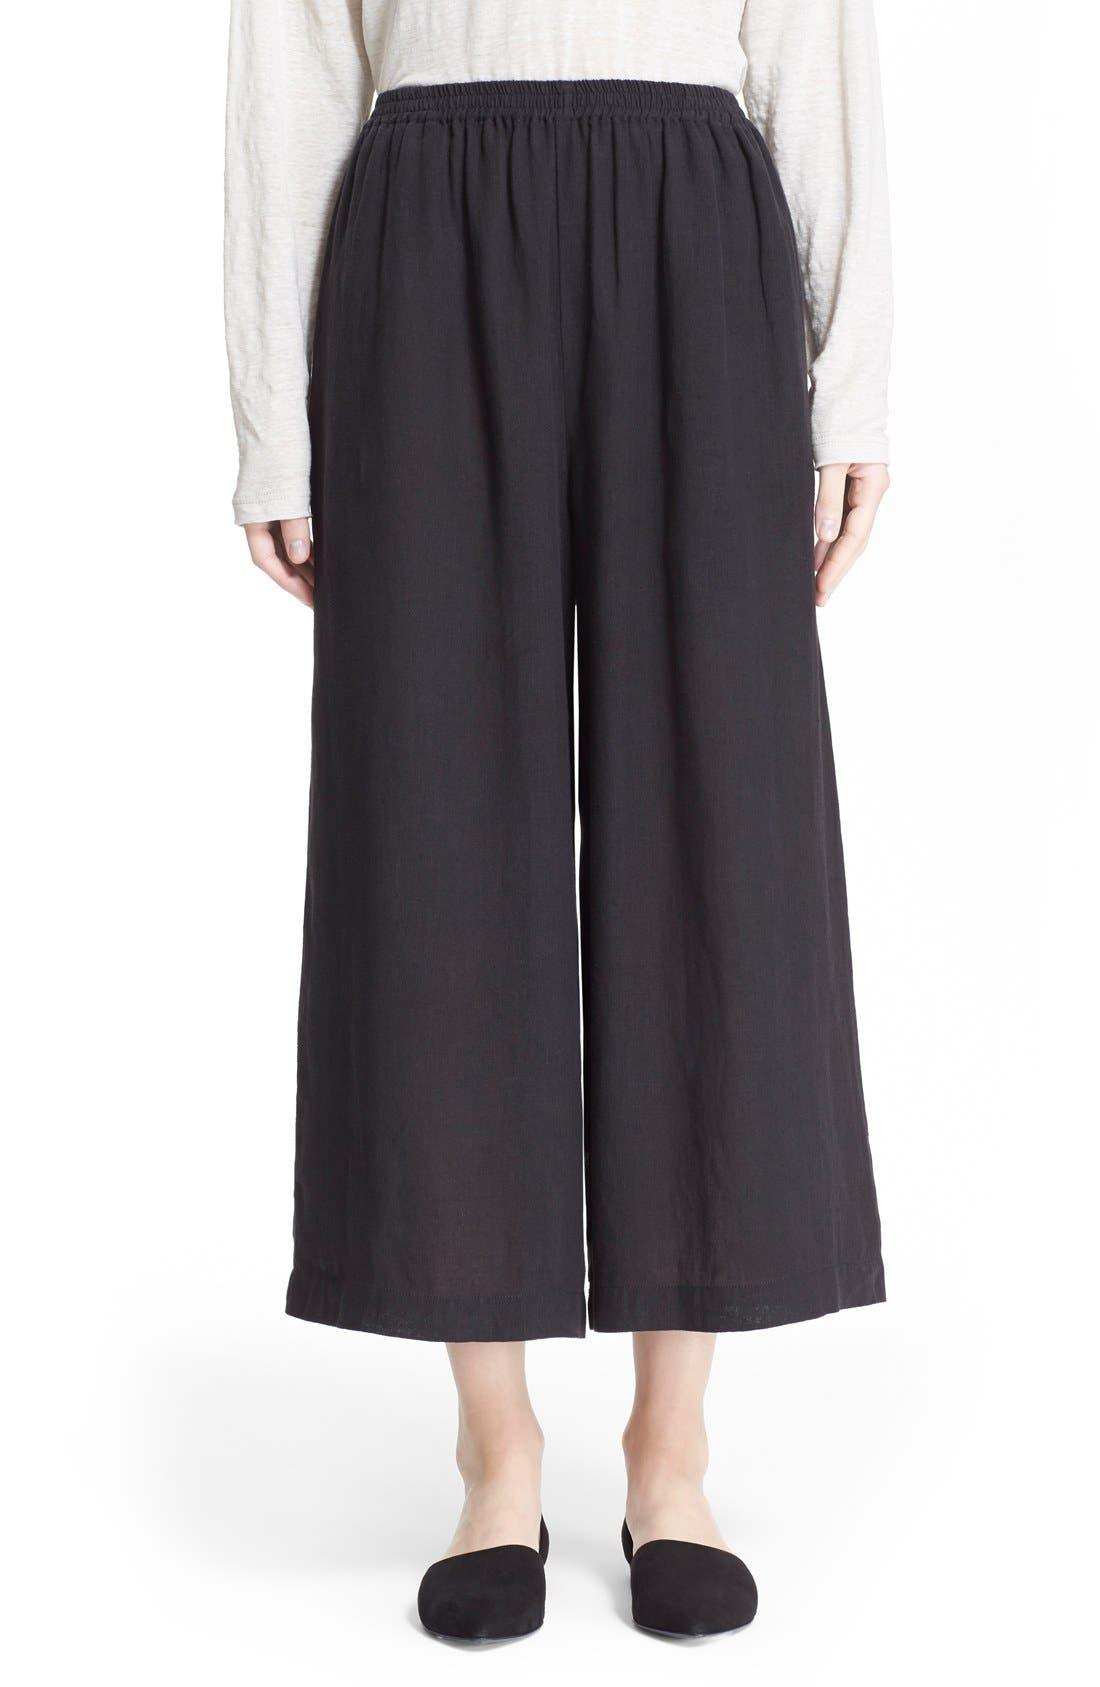 Alternate Image 1 Selected - eskandarHandkerchief Linen Flare Crop Pants